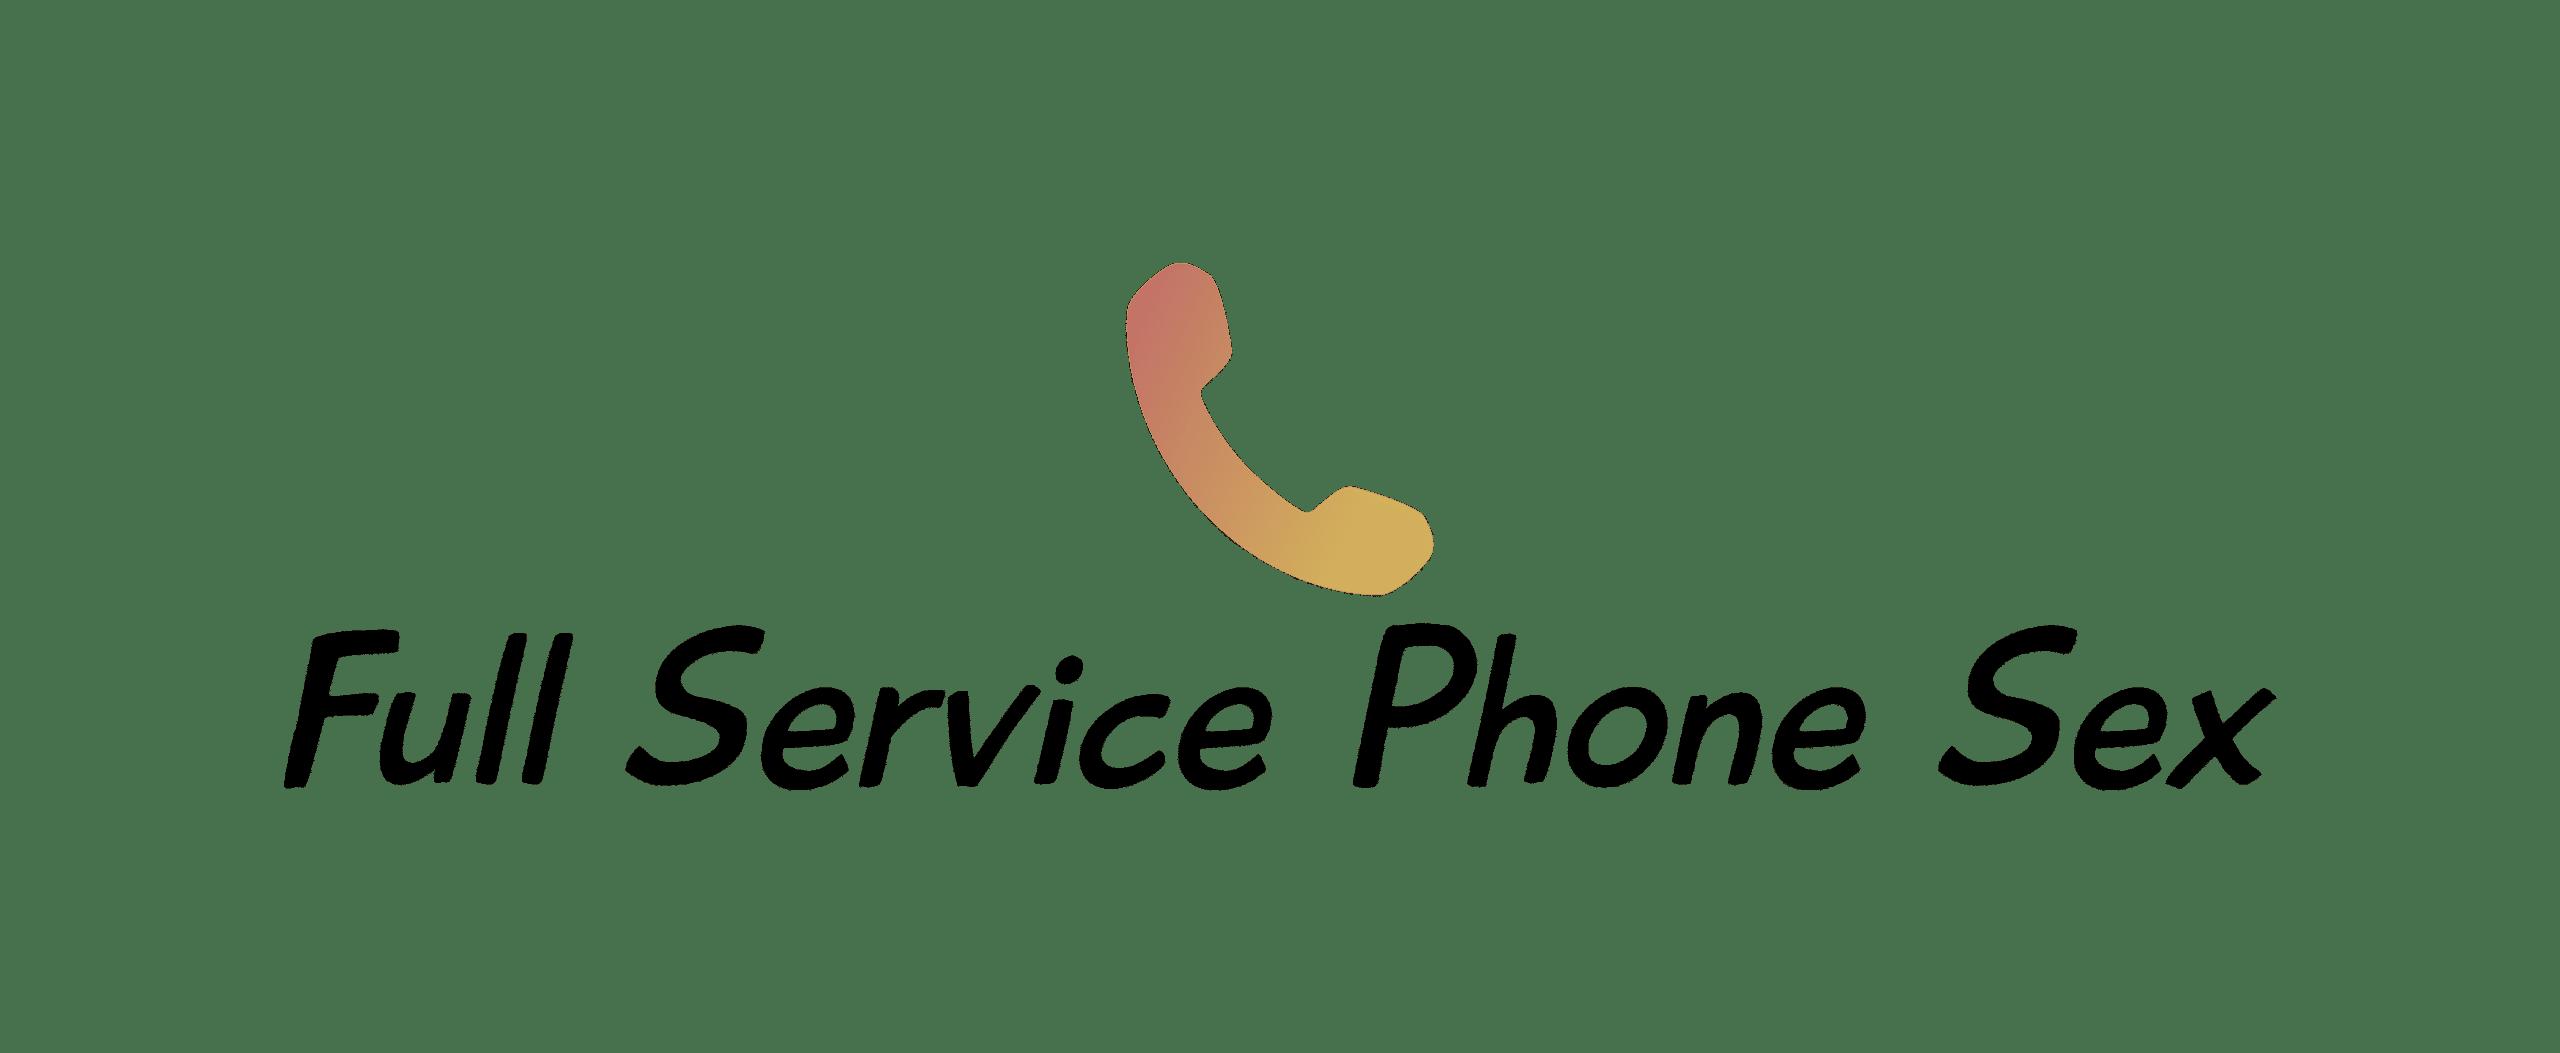 Full Service Phone Sex